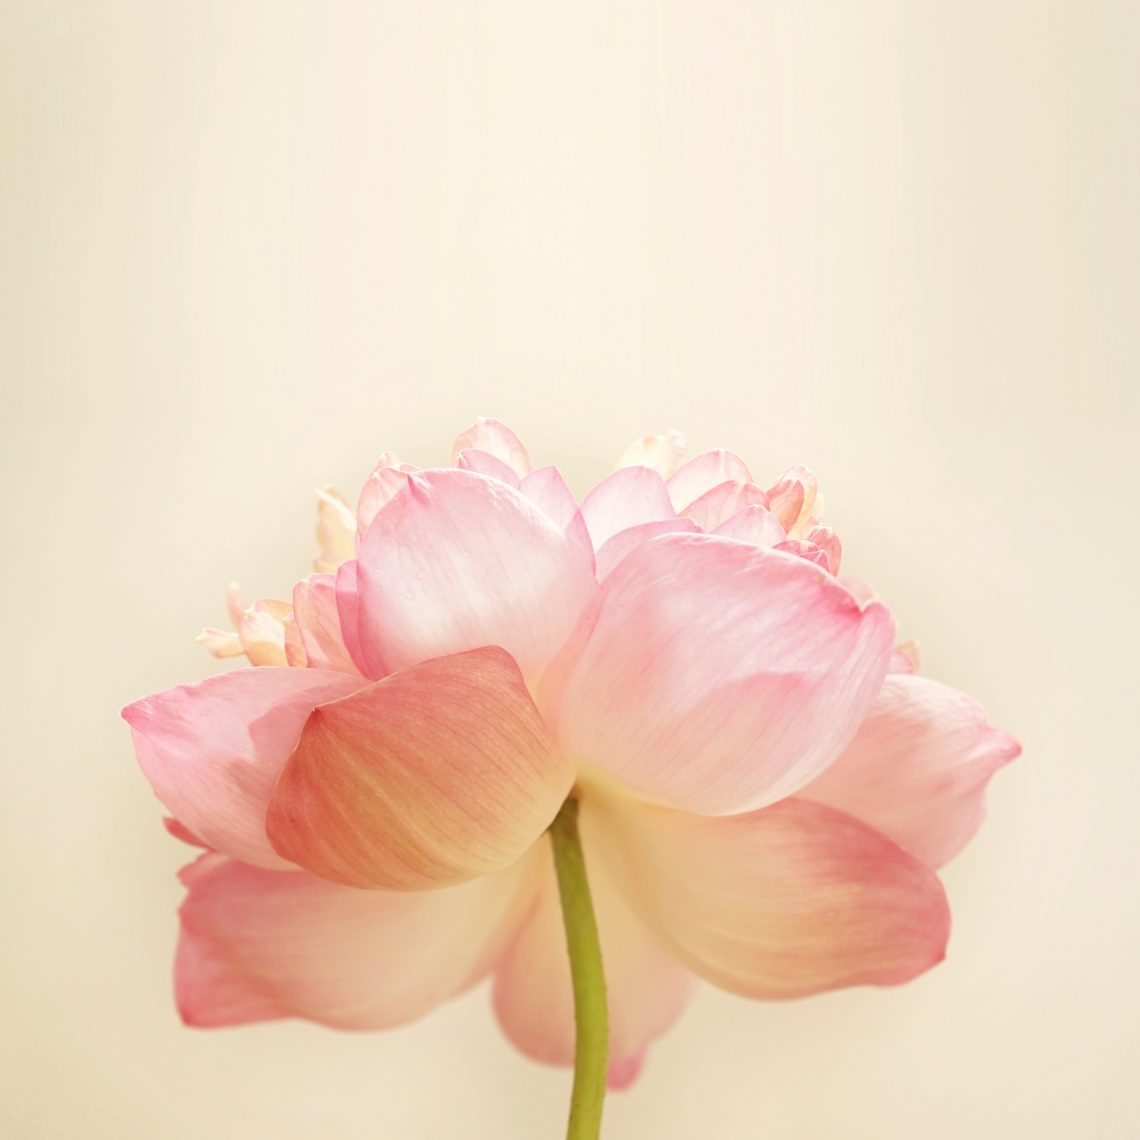 beautiful blooming floweredit